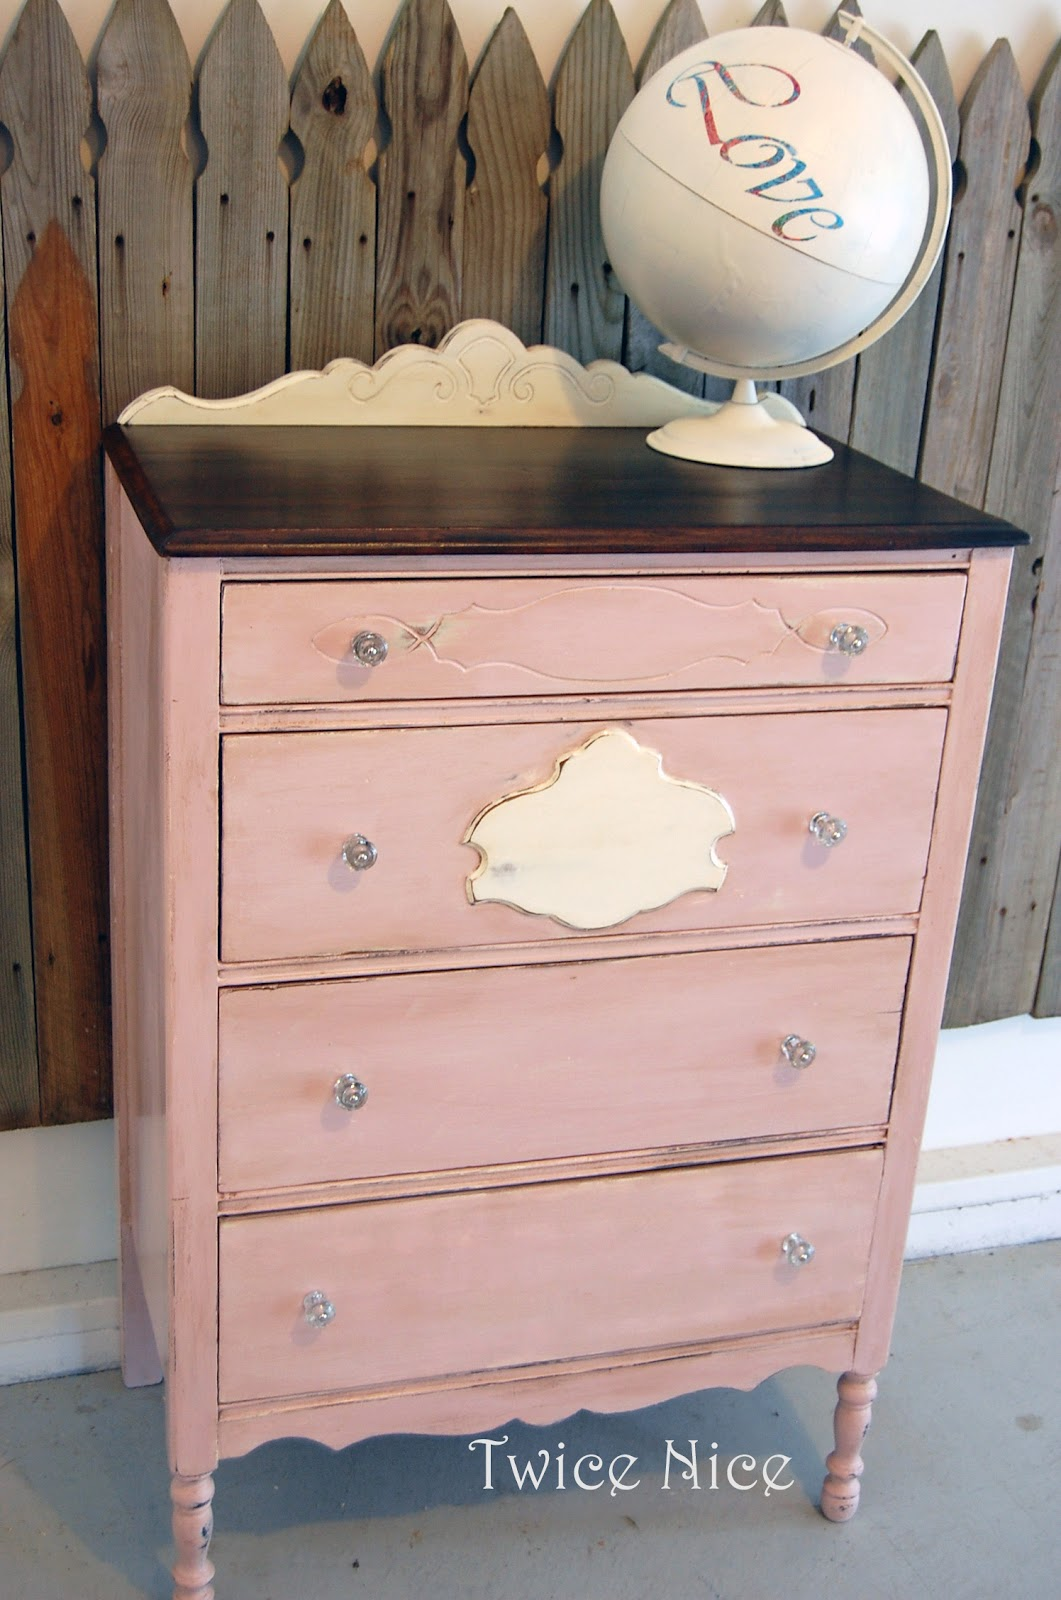 Pink Dressers For Girls Bedroom Set: Twice Nice: Sweet Pink Dresser